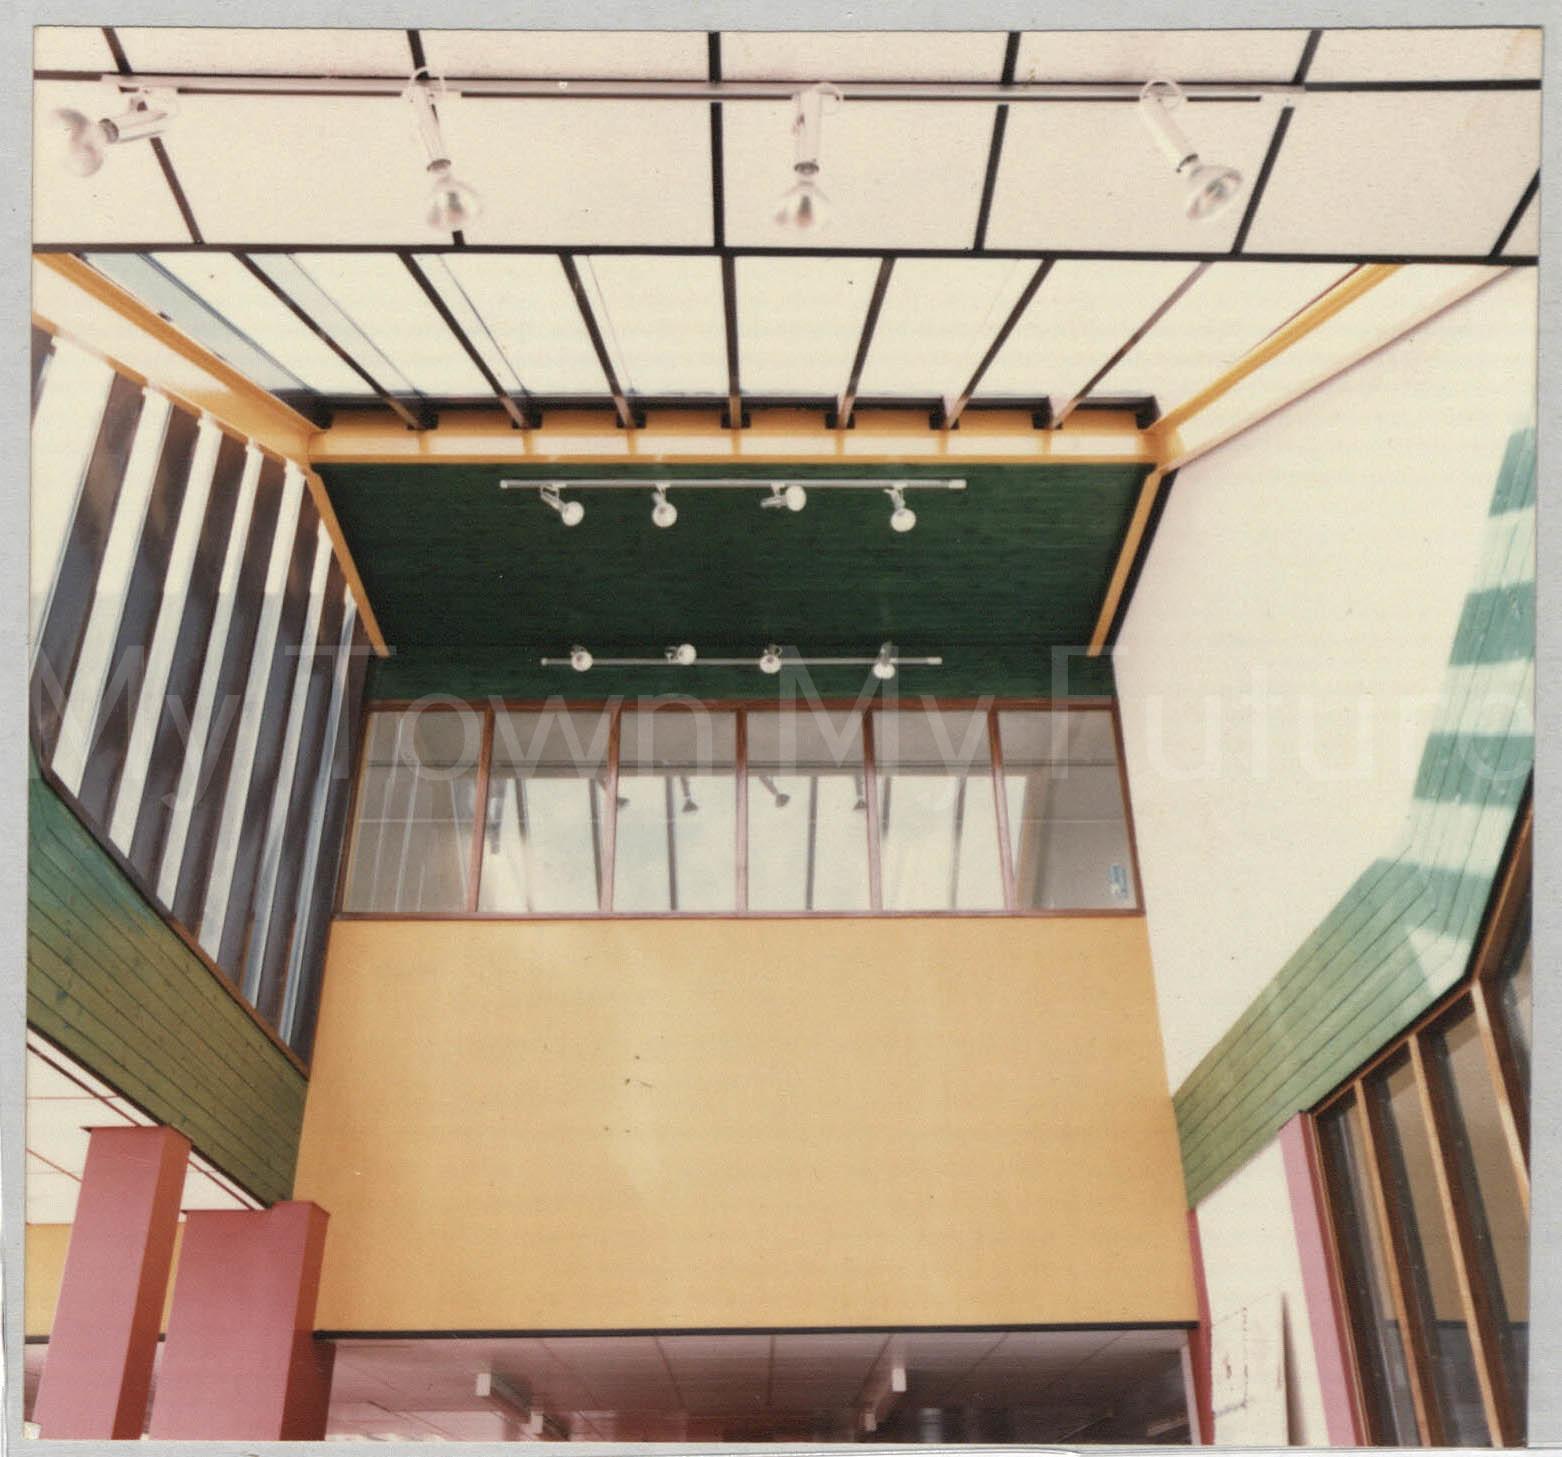 Teesside Po;ytechnic College